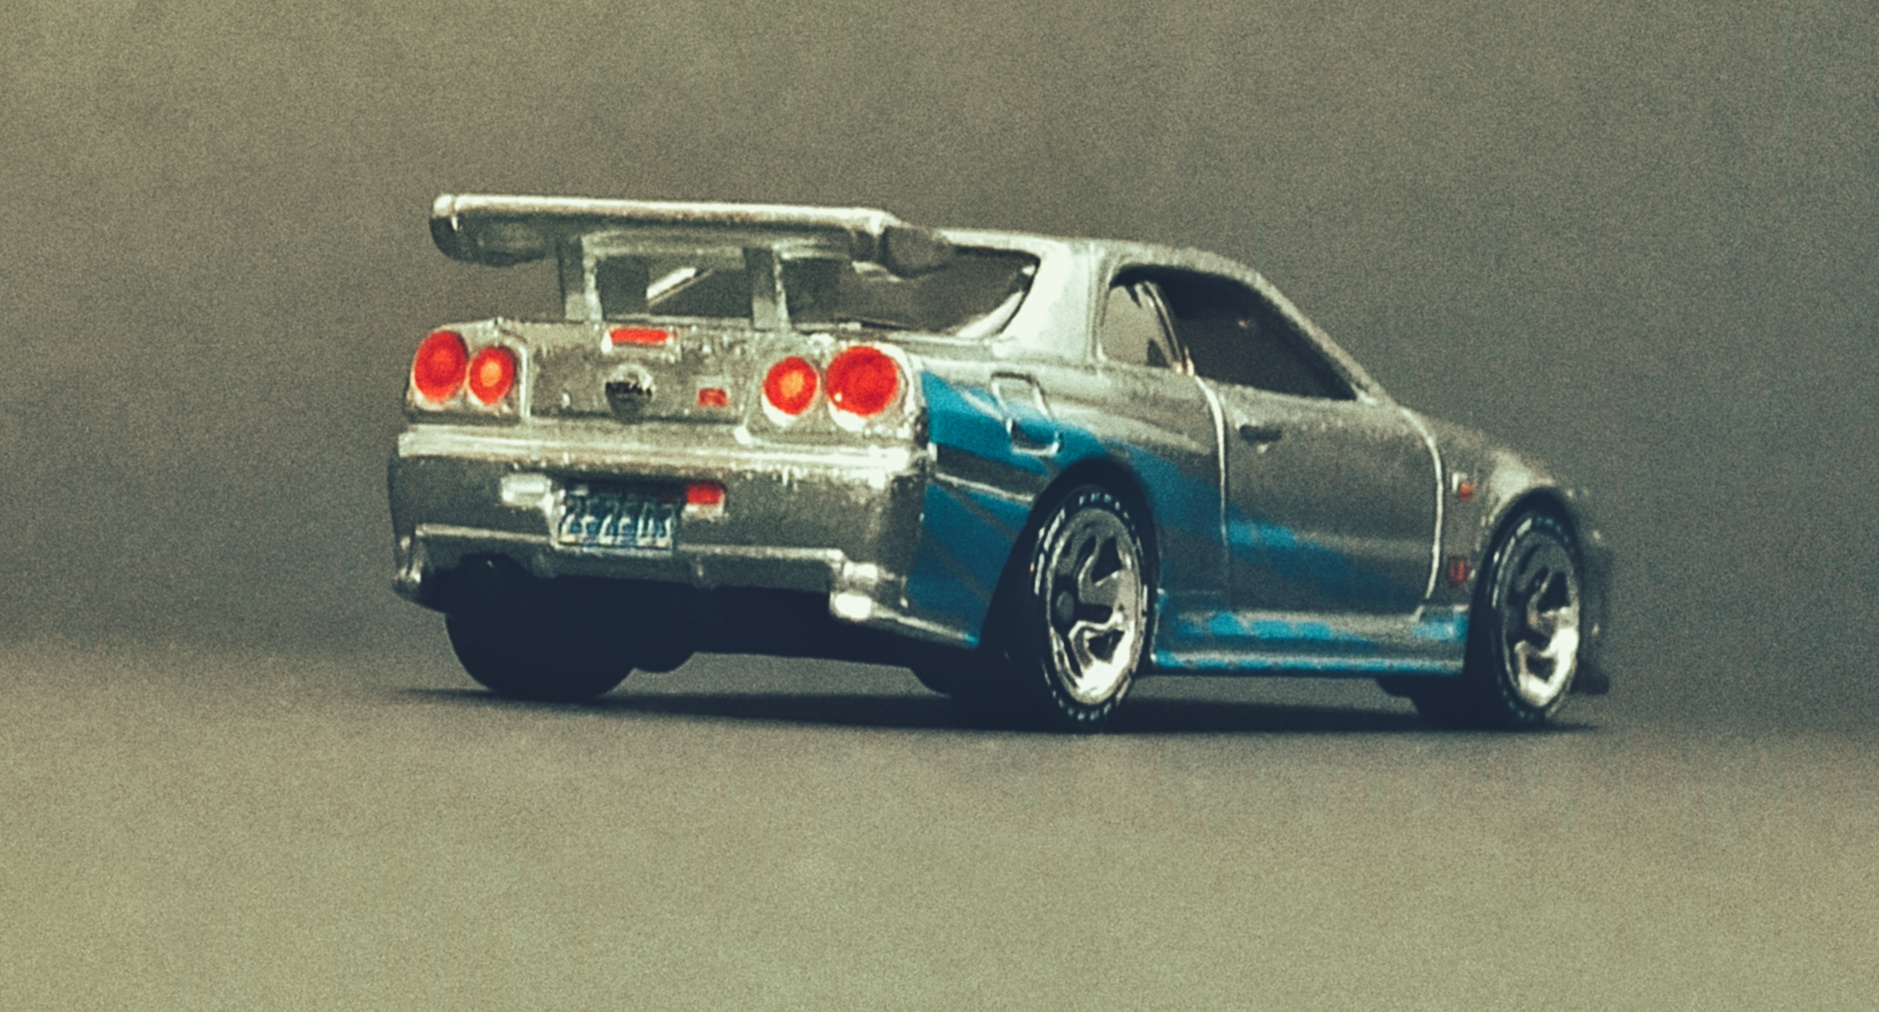 Hot Wheels id Nissan Skyline GT-R (R34) (HCJ08) 2021 HW Screen Time (01/03) zamac back angle